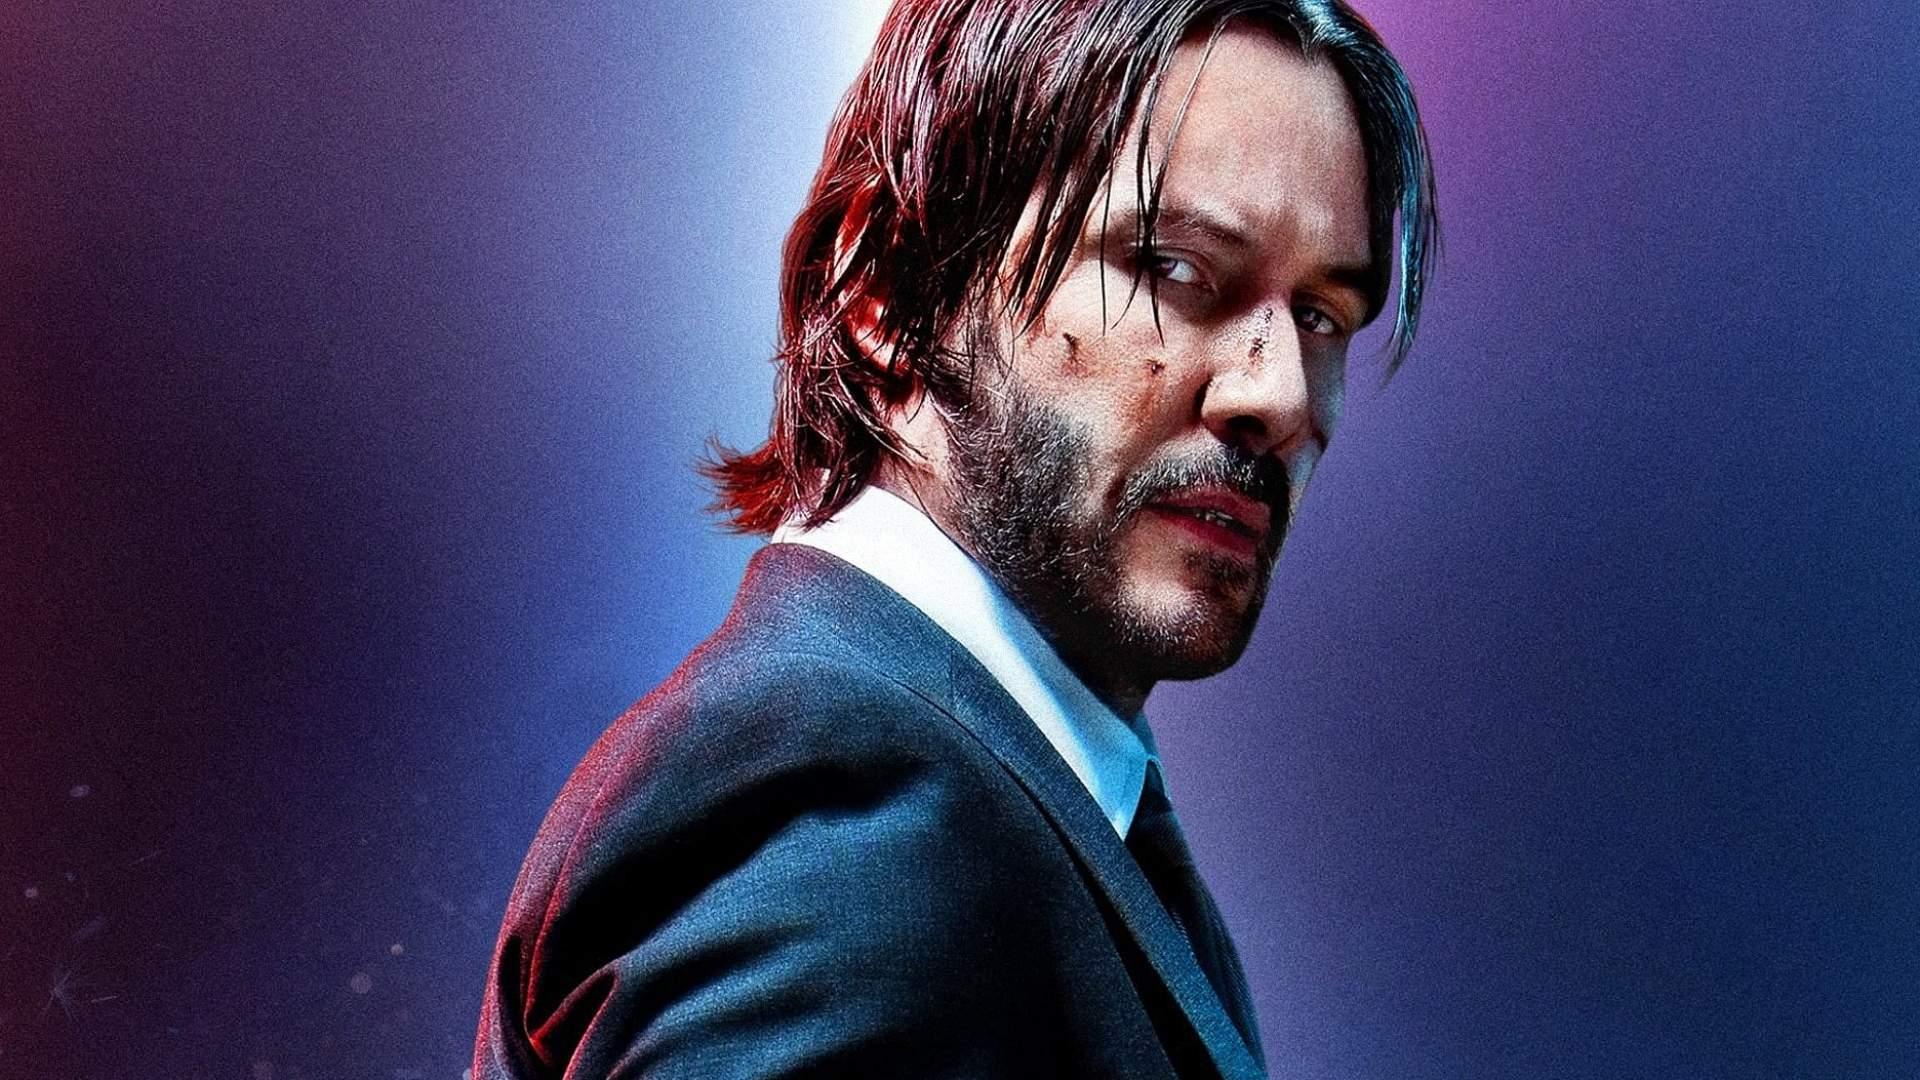 OVERKILL: Ob 'John Wick 4' ins Kino kommt, entscheiden wir alle